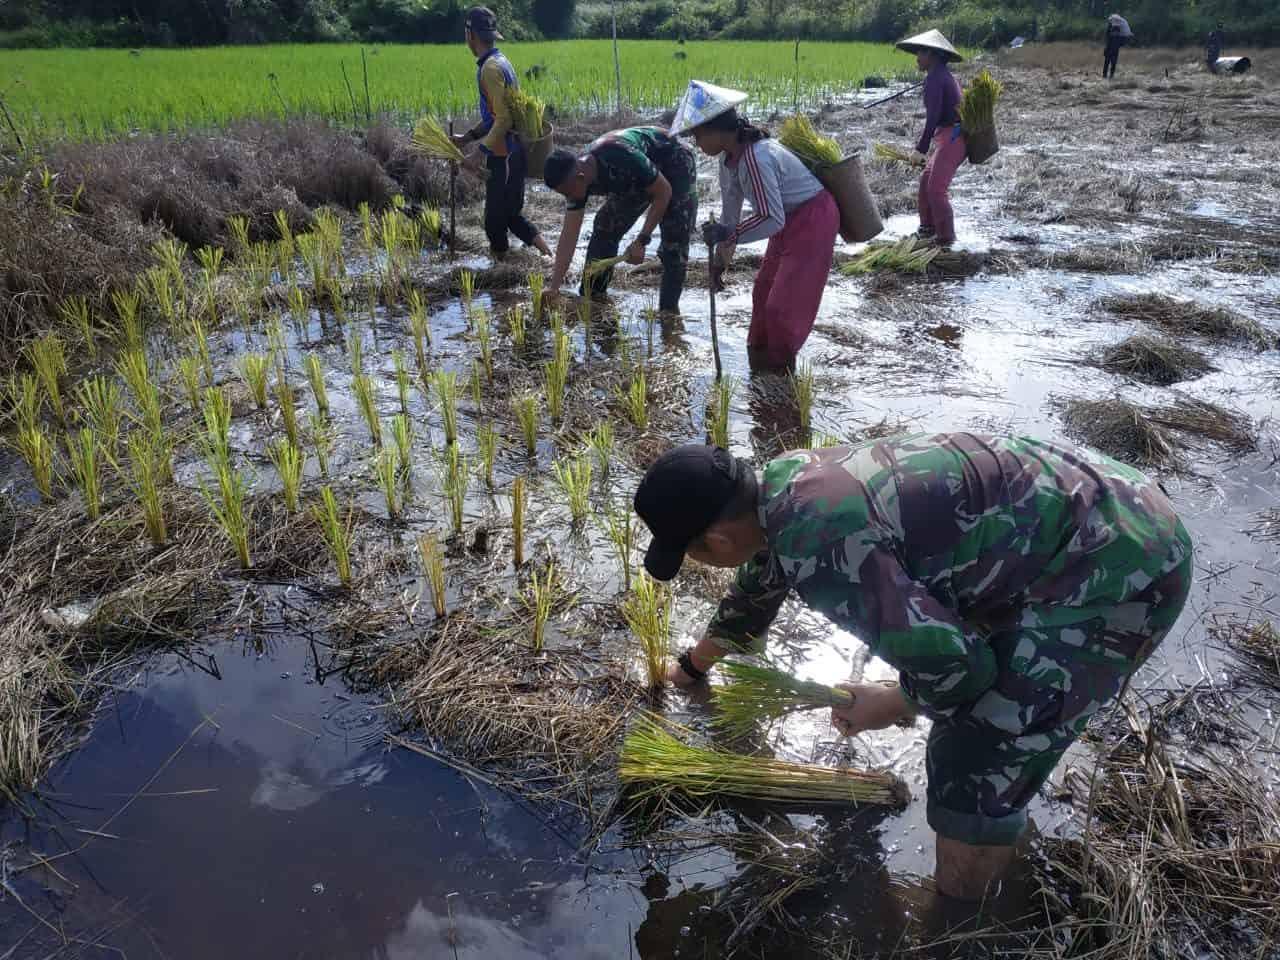 Turun Ke Sawah, Wujud Kebersamaan Satgas 133/YS Dengan Masyarakat Di Tapal Batas